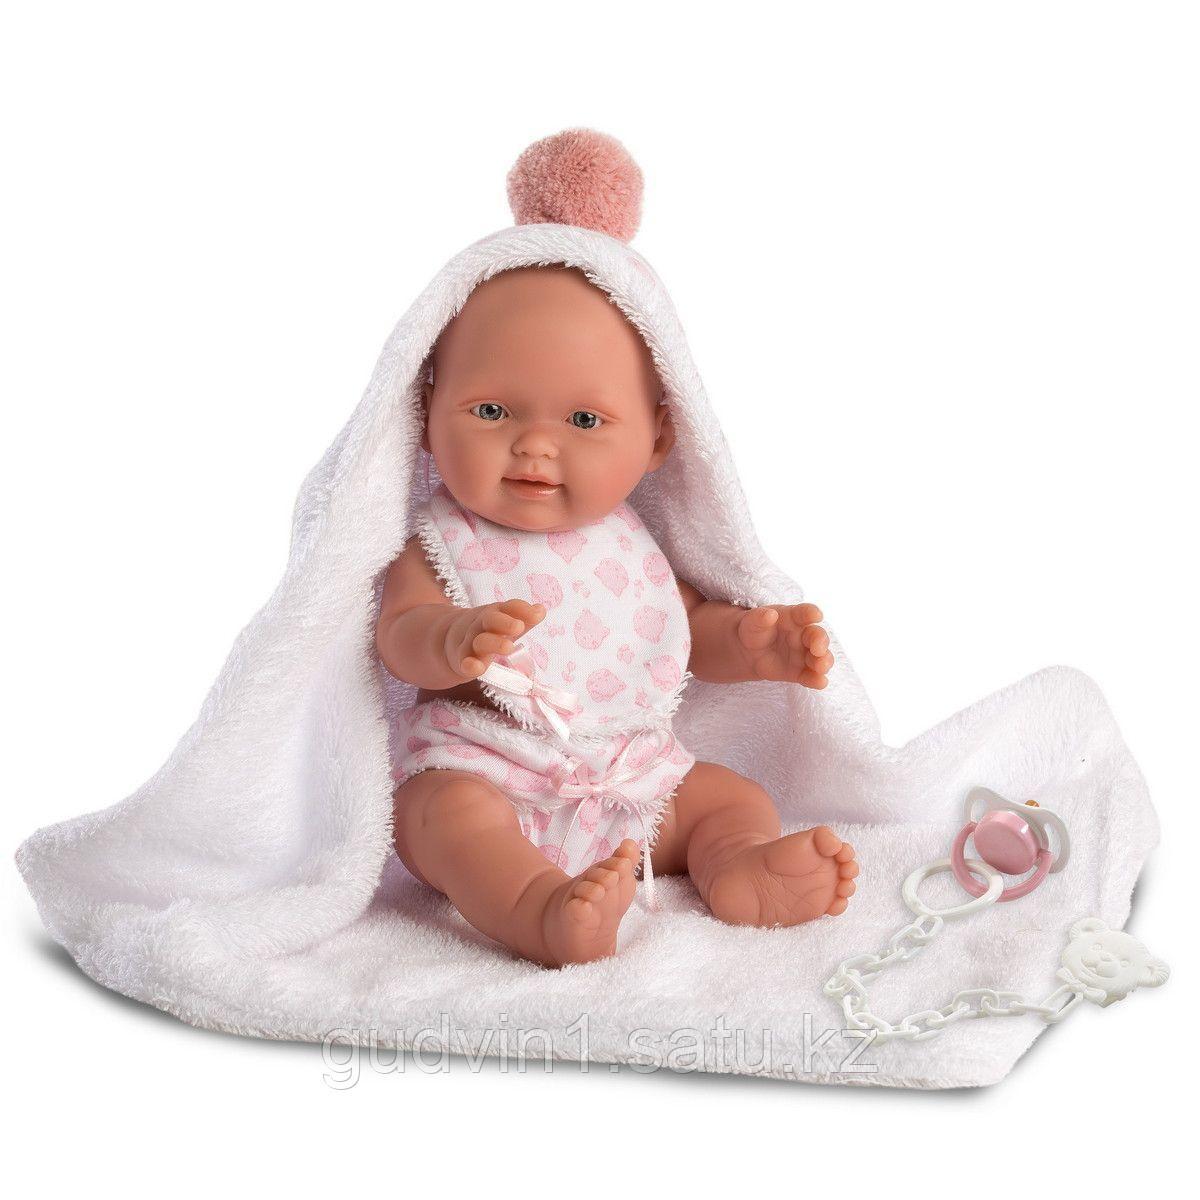 LLORENS: Кукла малышка 26см в розовом банном халатике 63548